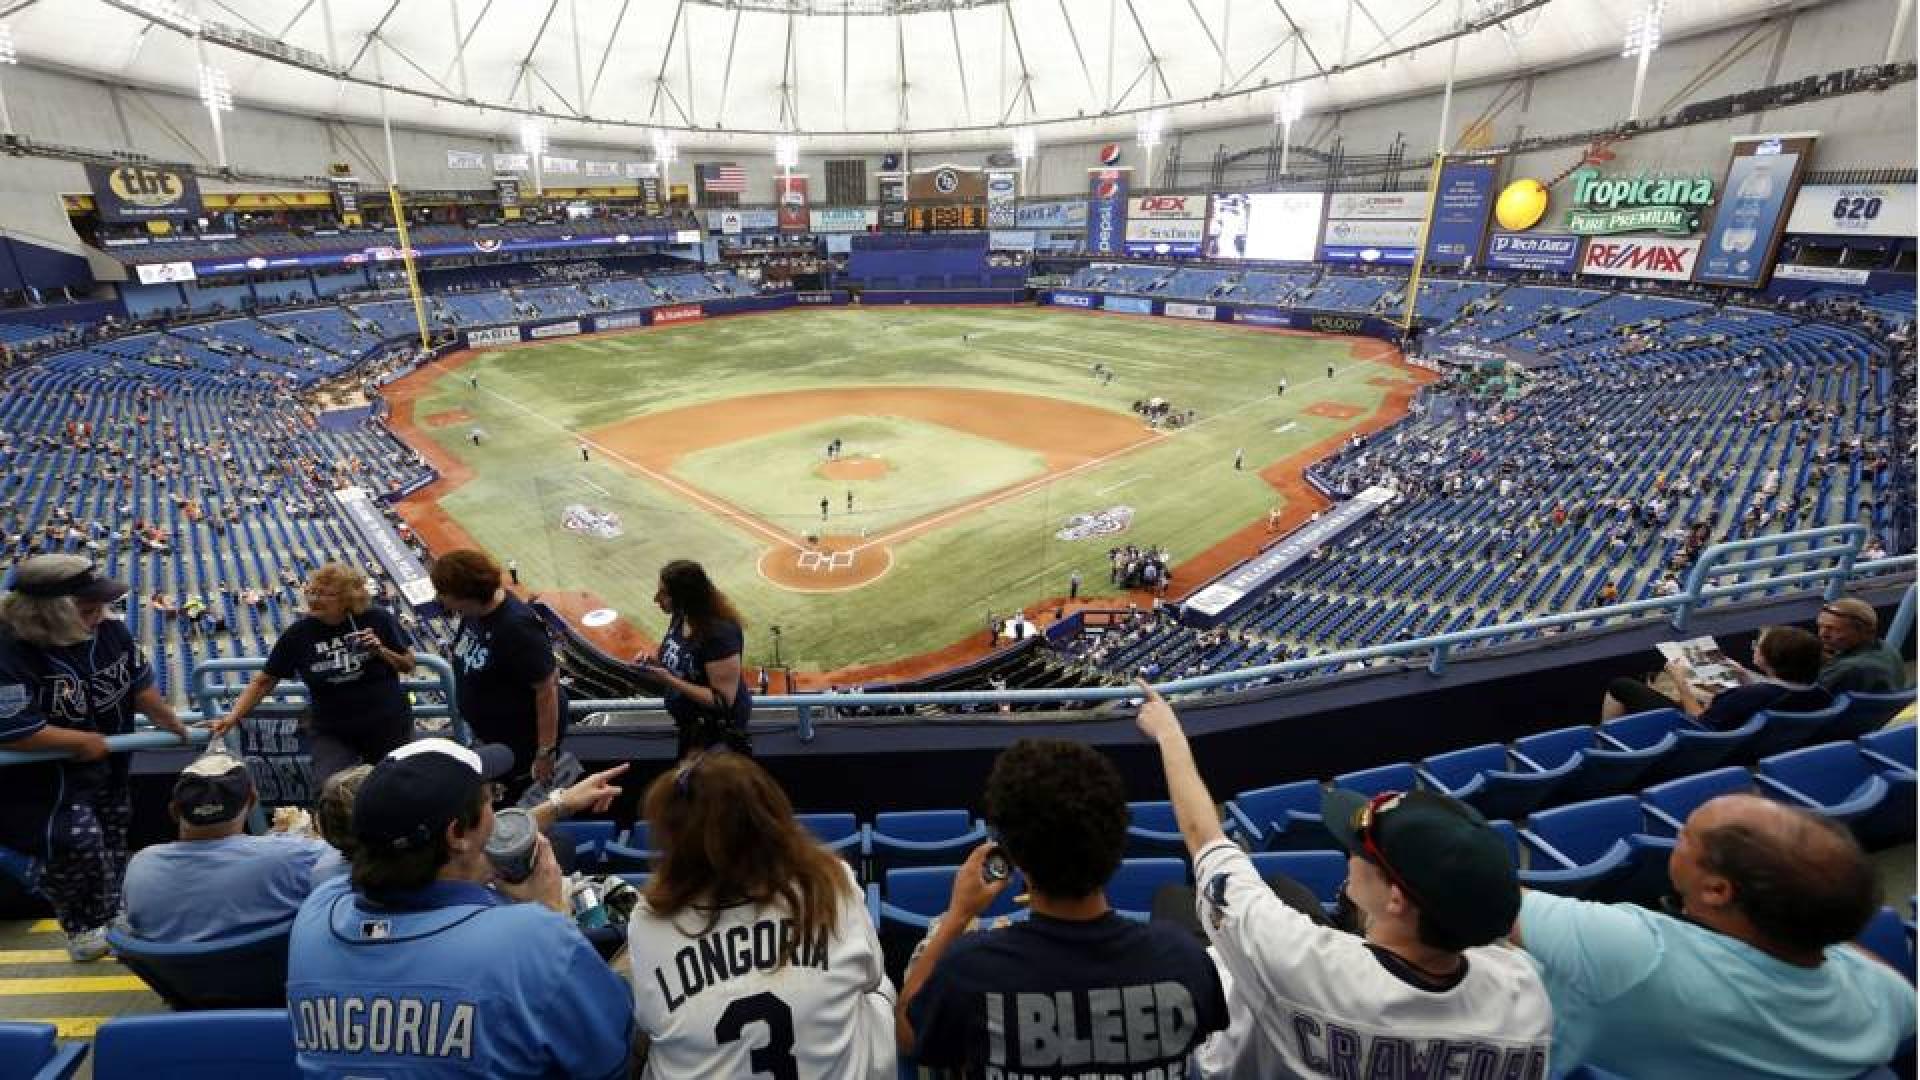 Le Tropicana Field, le domicile actuel des Rays de Tampa Bay